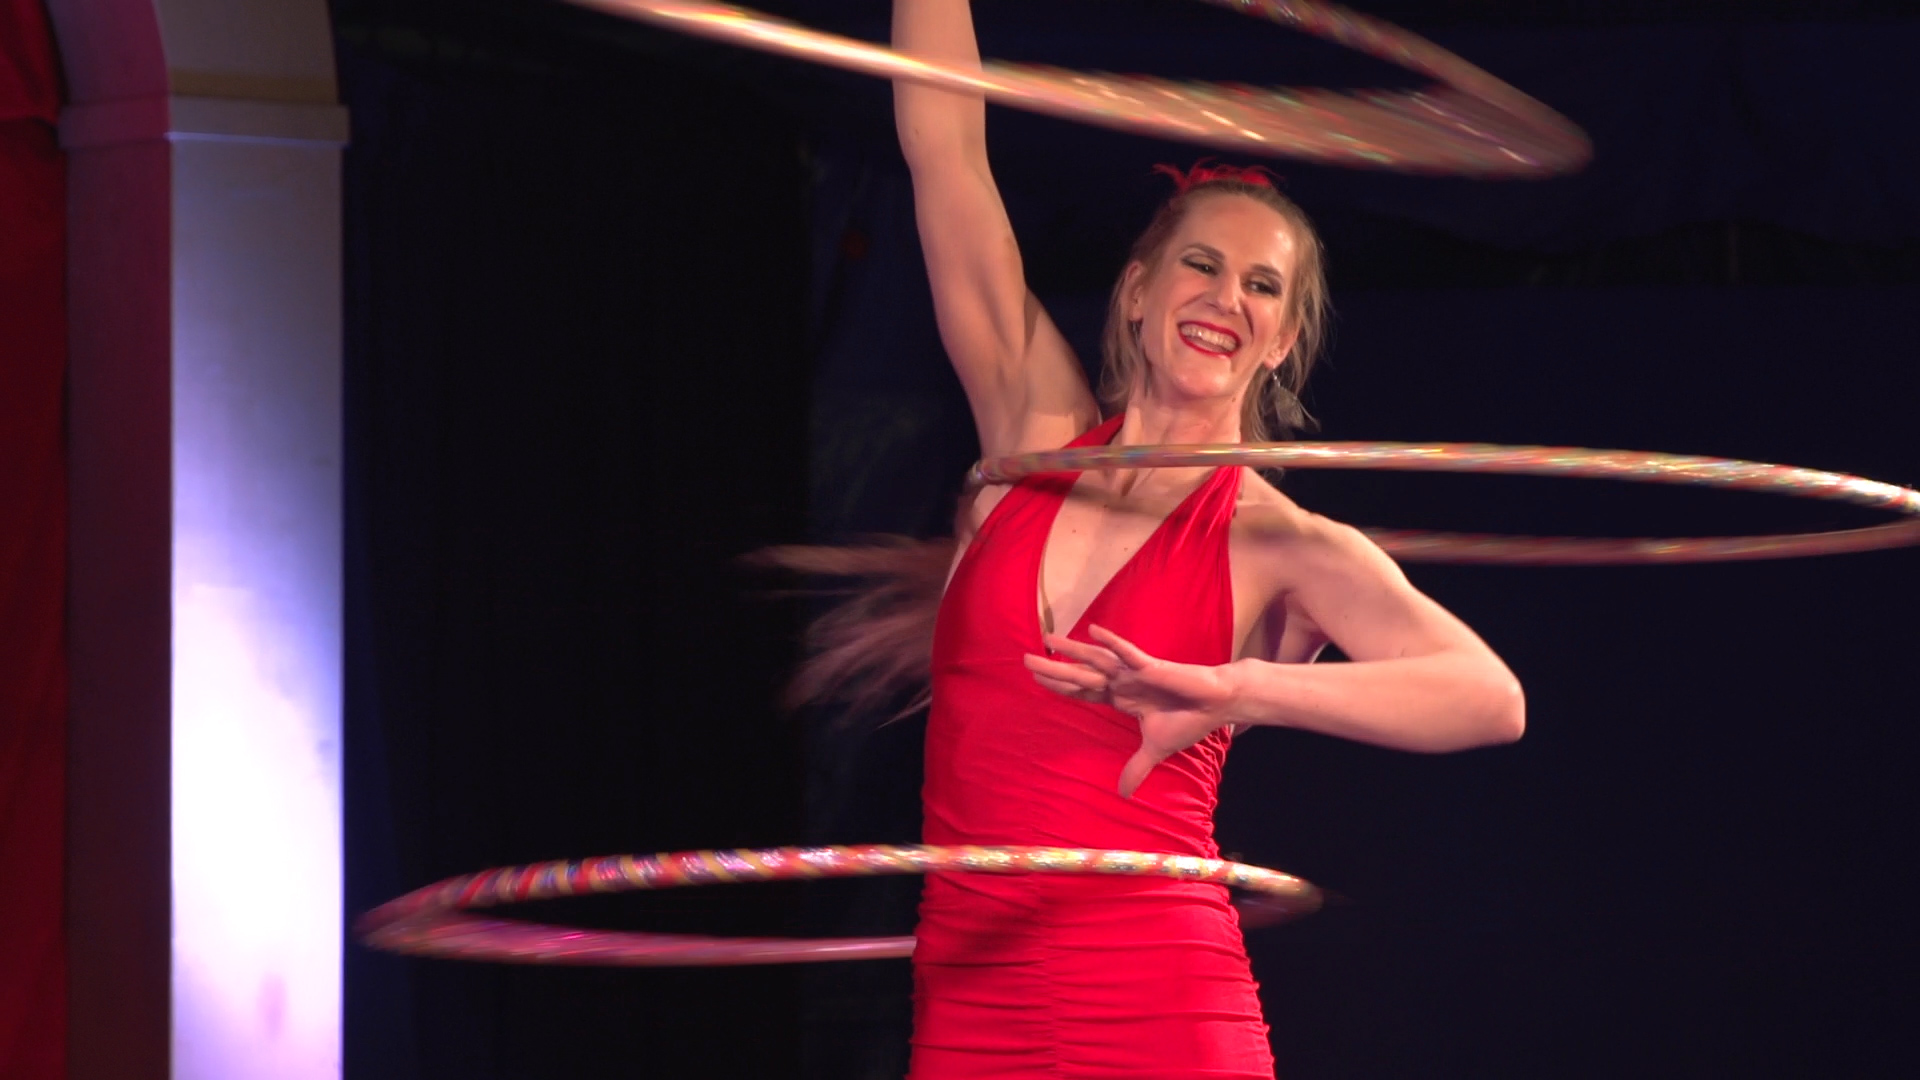 Laura-Cohen-Hula-Hoop-Show-circusevents-koeln-3